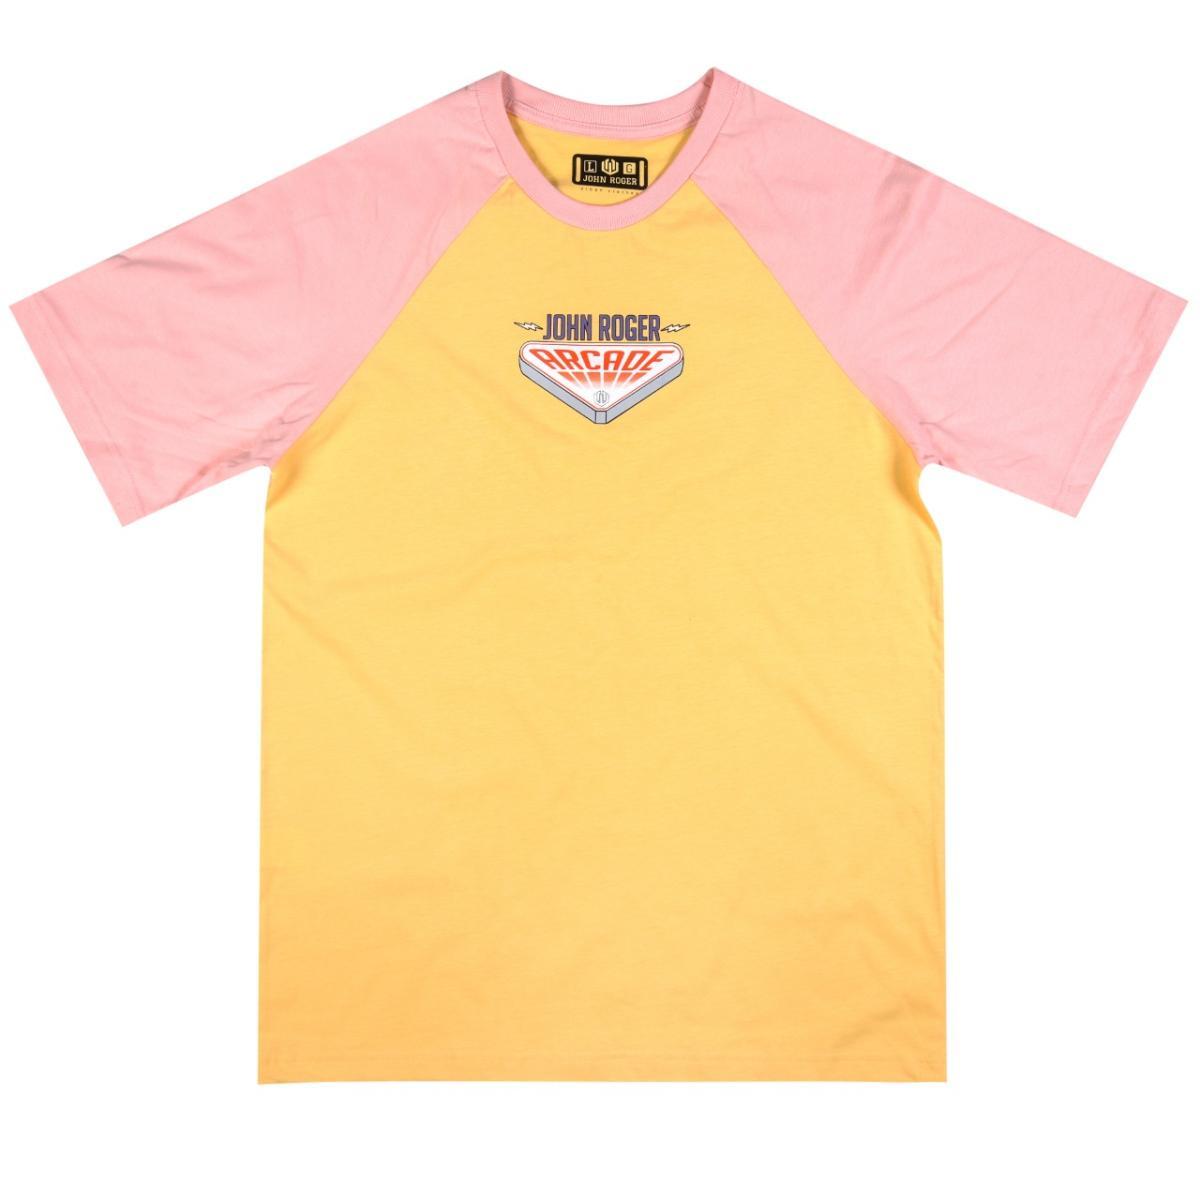 Camiseta Raglan John Roger - Arcade